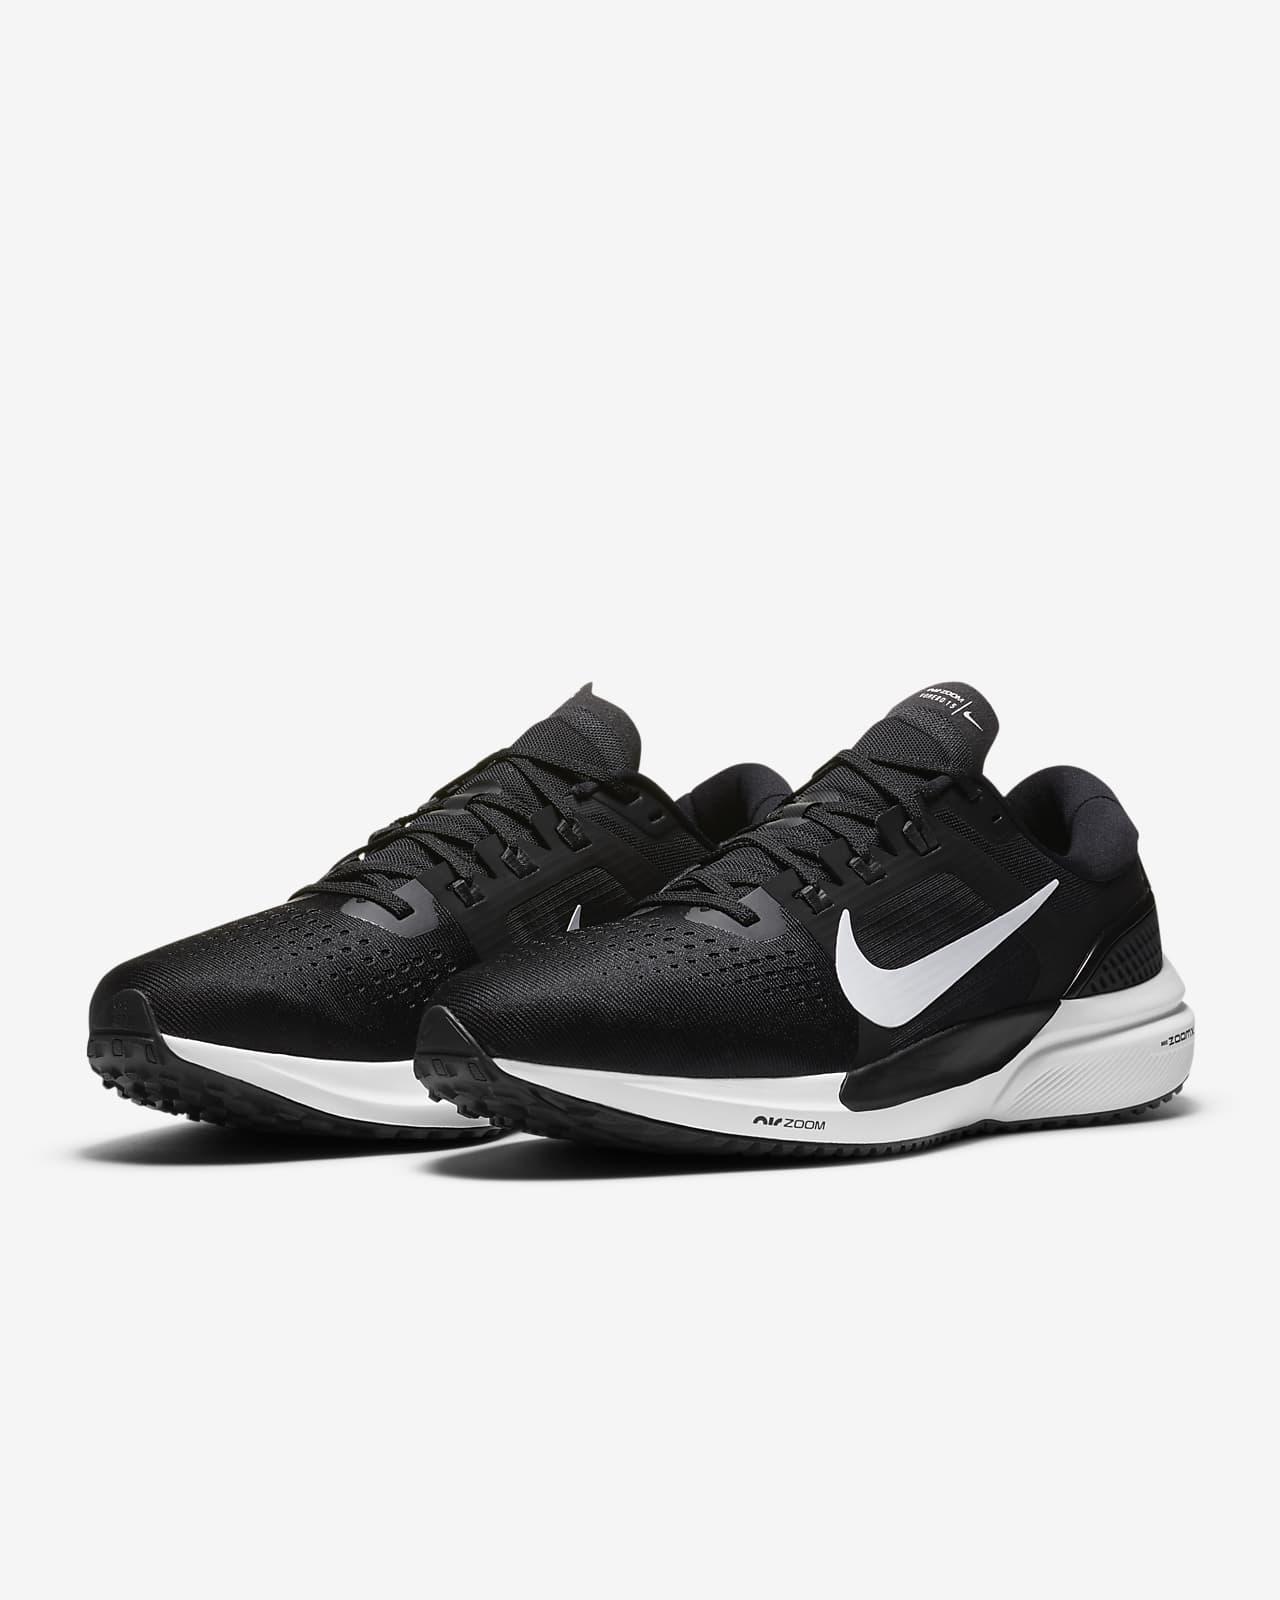 Nike Air Zoom Vomero 15 Men's Running Shoe. Nike IN